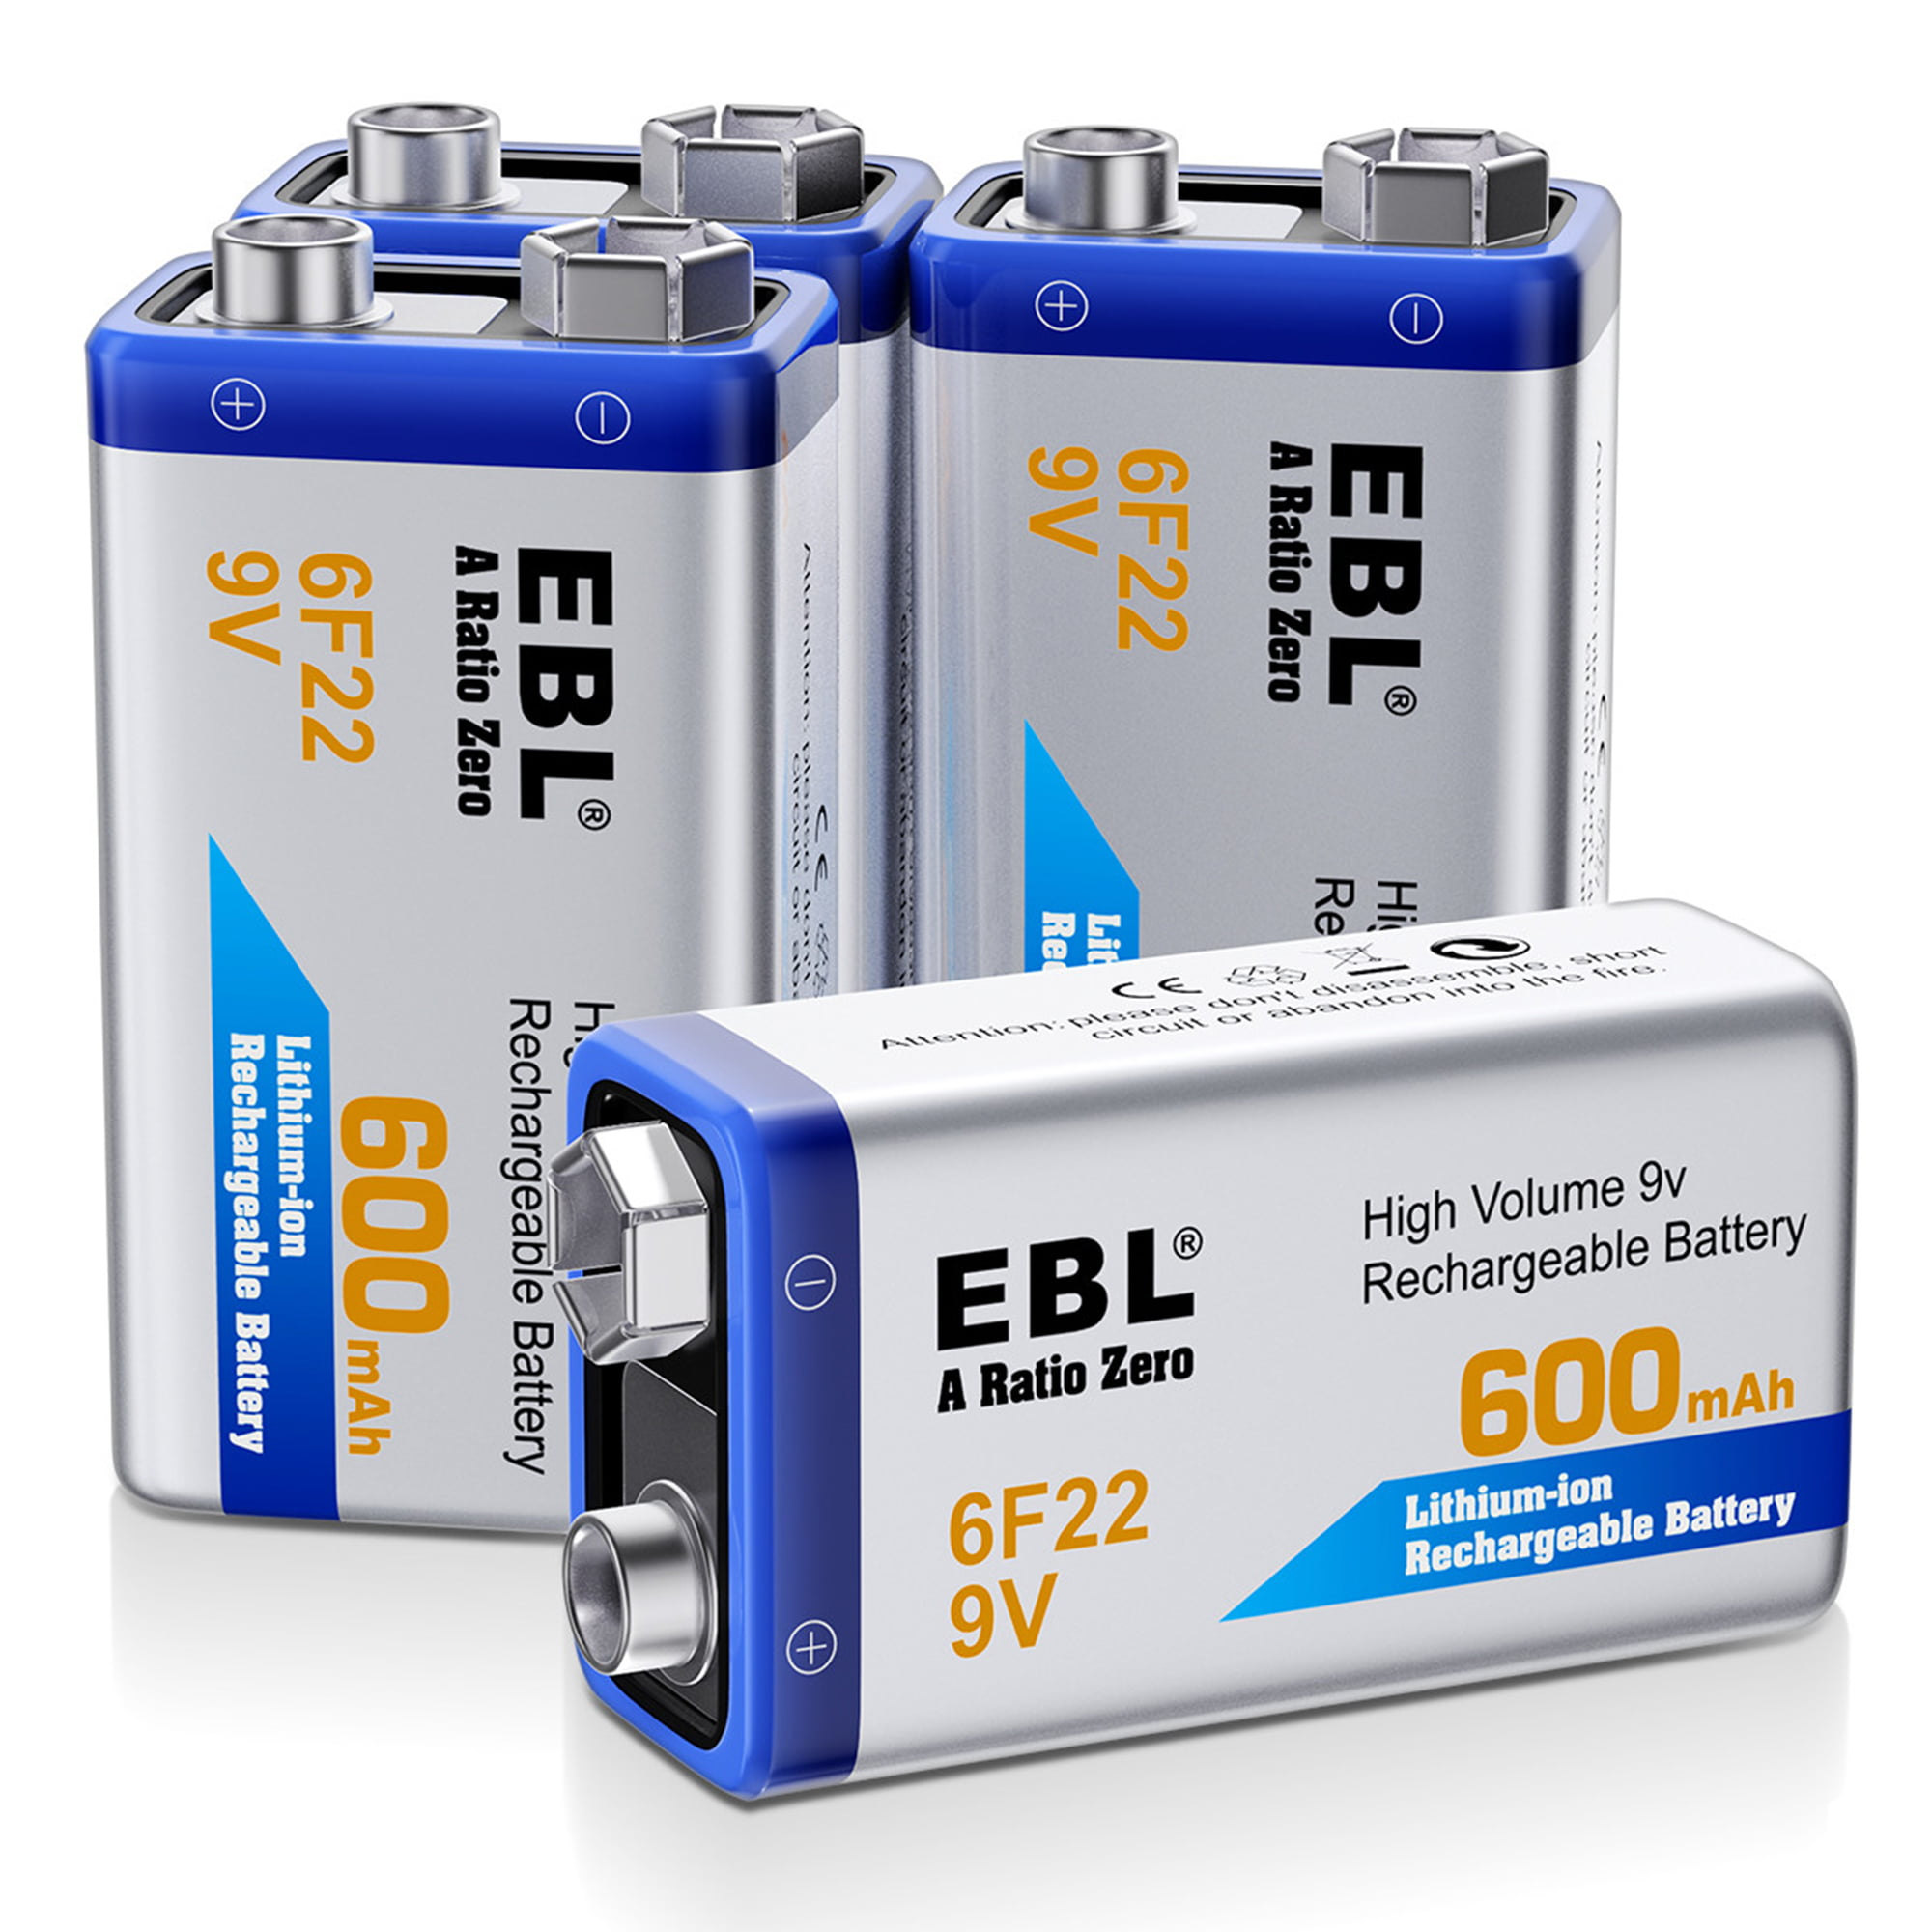 Akku 9V Block 600mAh Li-ion Batterien 6F22,Lithium-ion wiederaufladbare 9 Volt